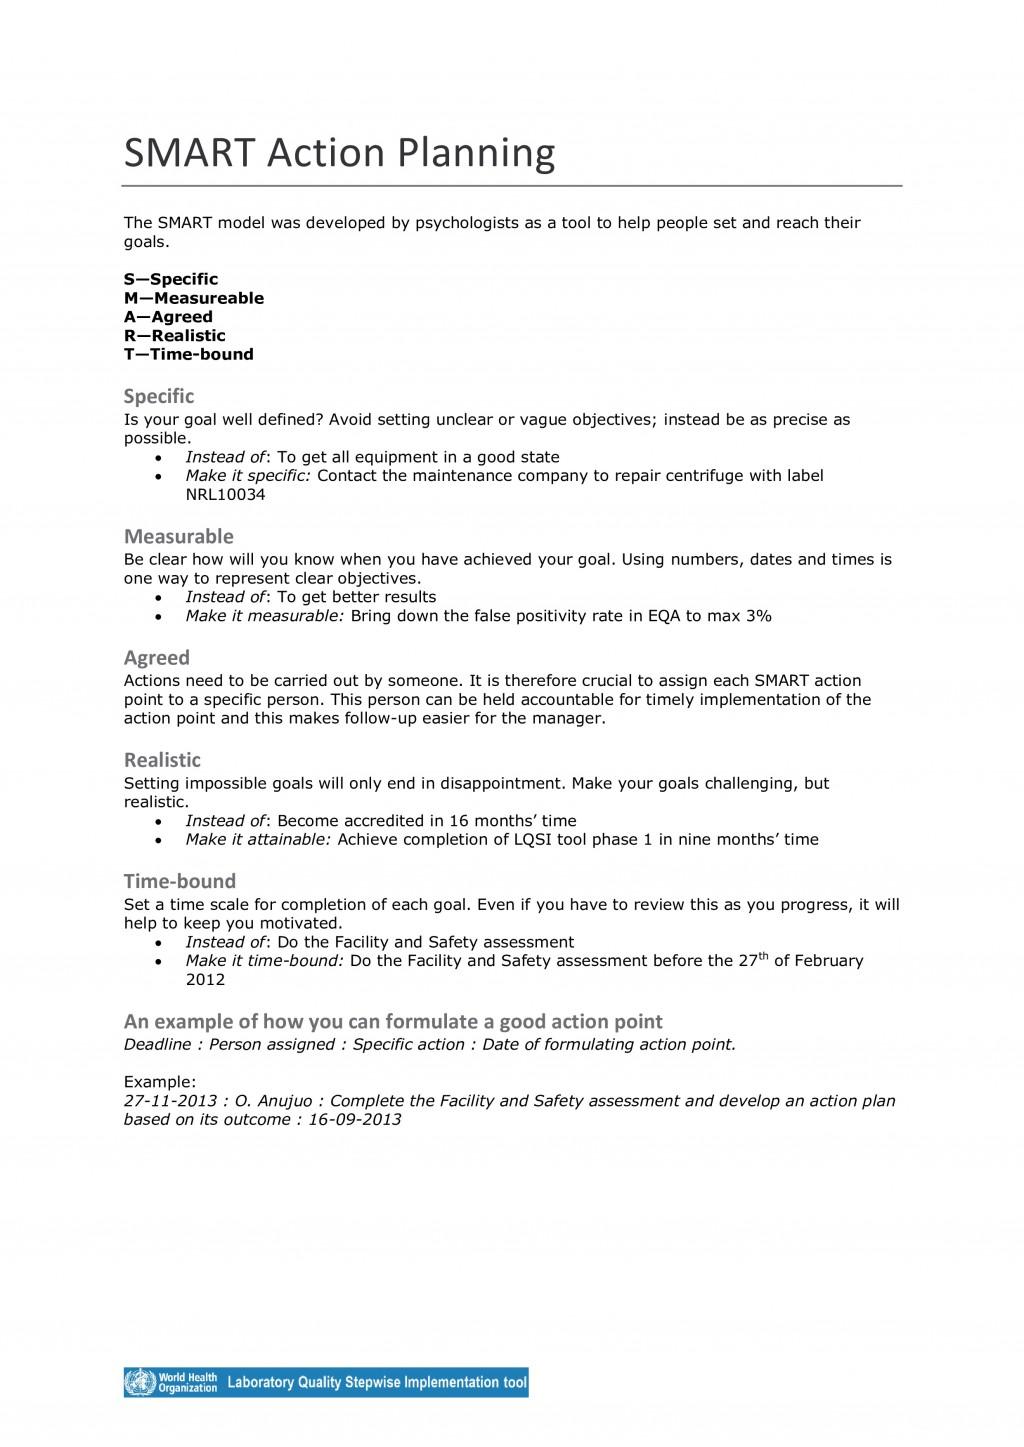 003 Sensational Smart Action Plan Template Example  Nursing For Busines FreeLarge